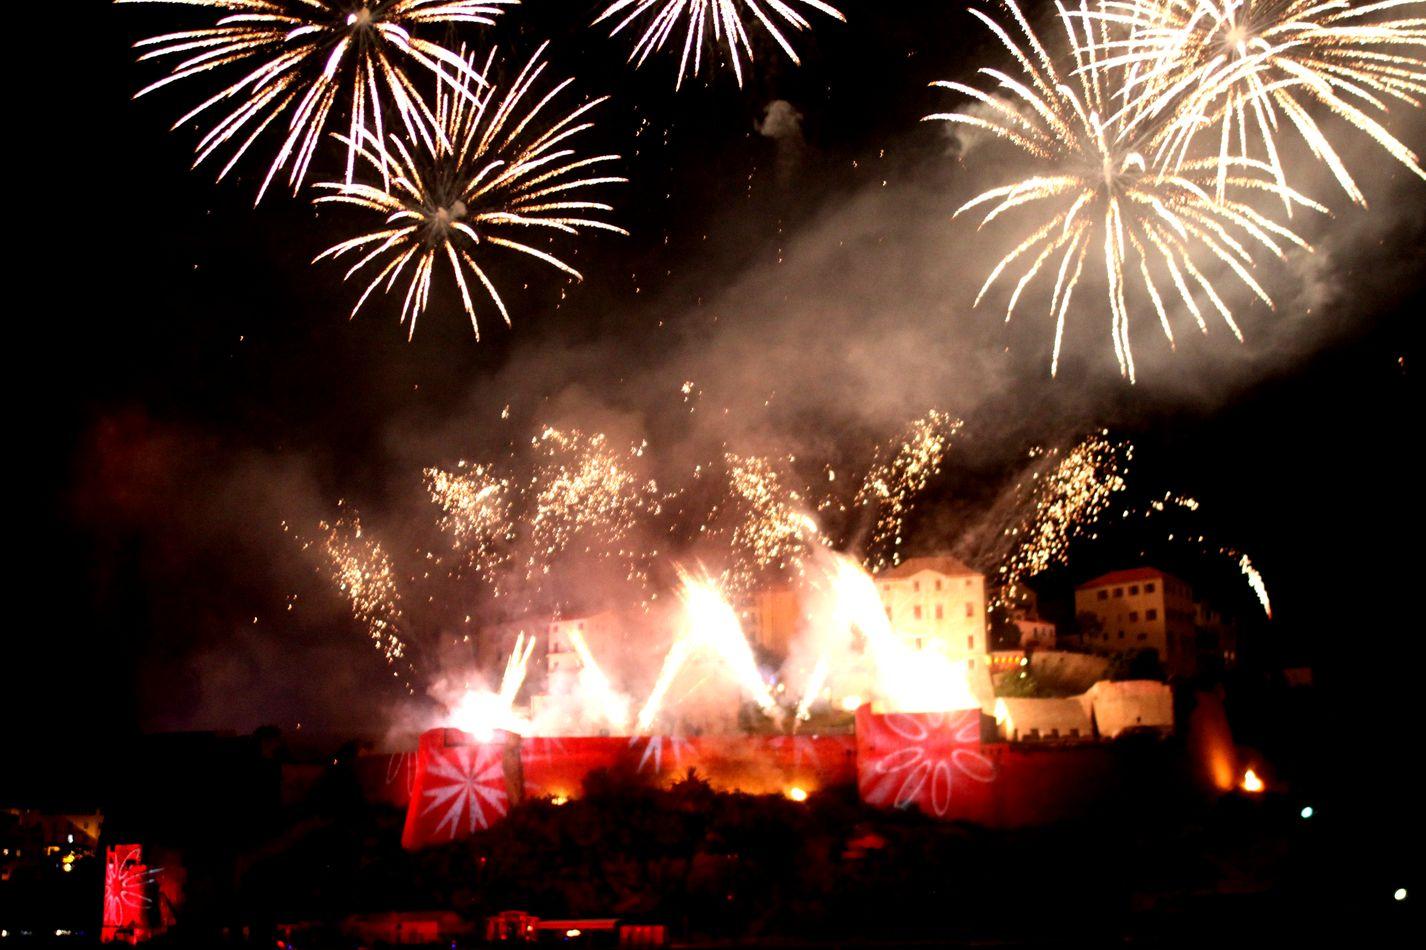 Les festivités du 15 août à Calvi